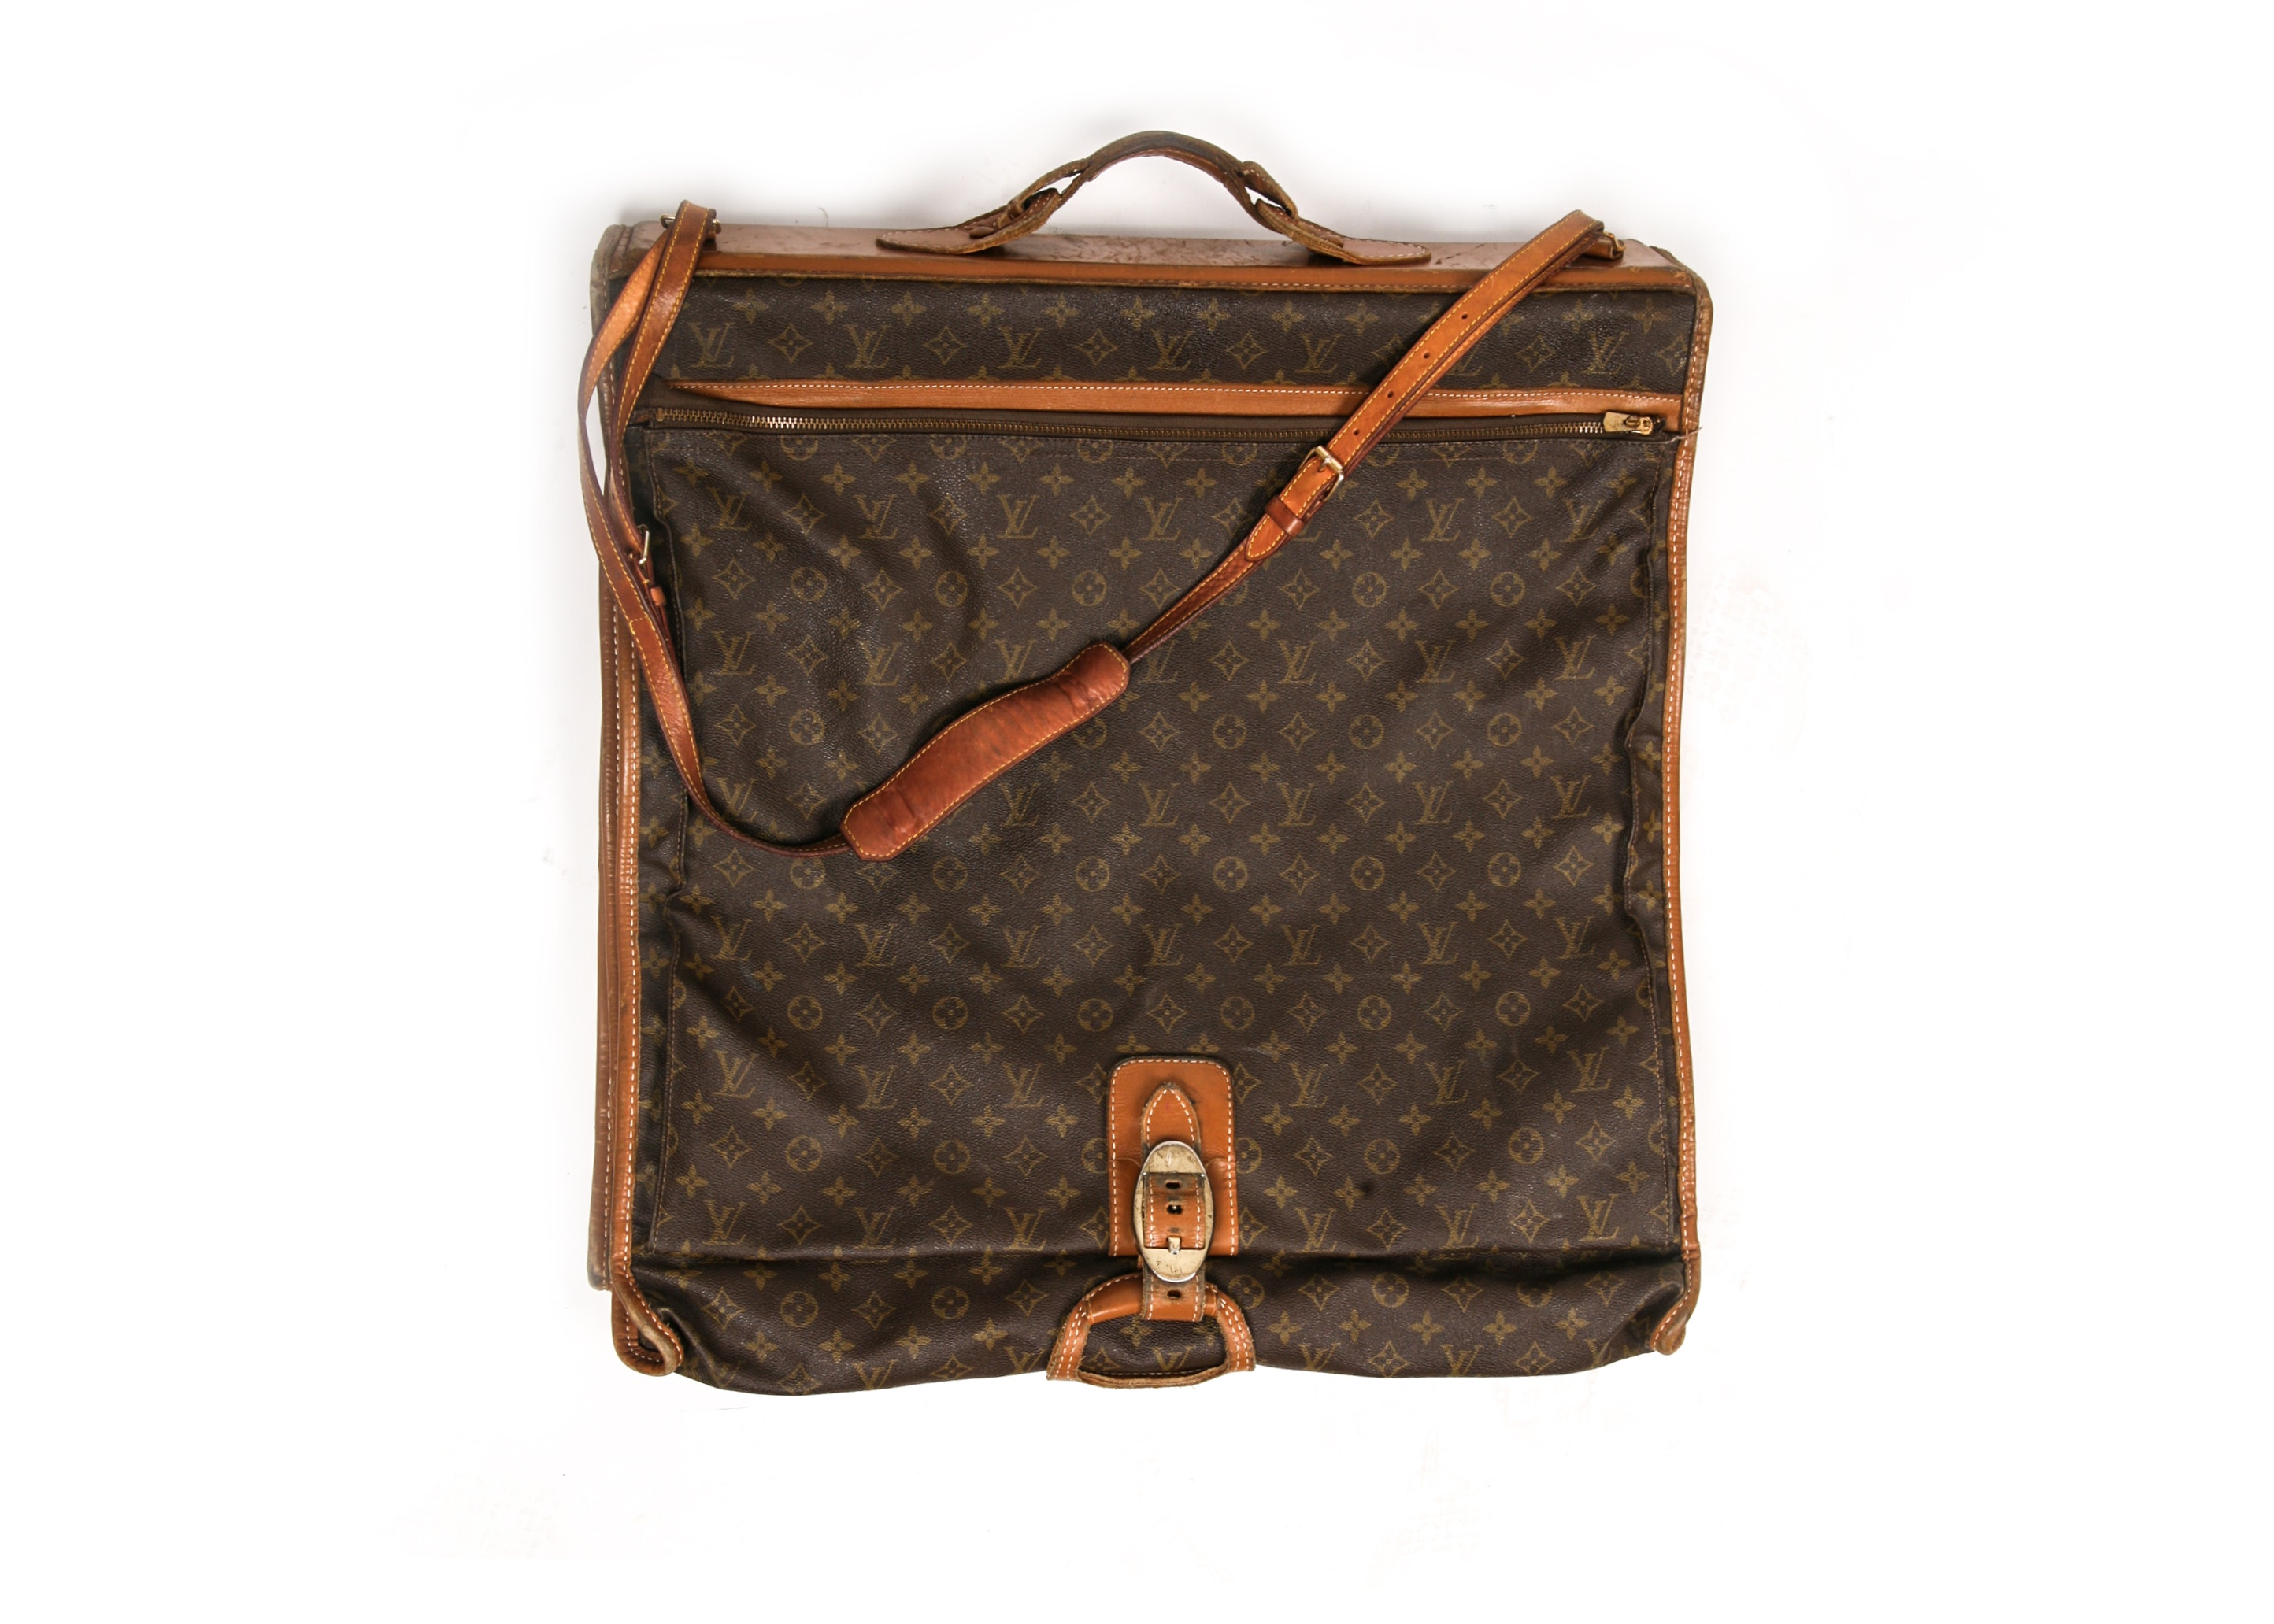 Circa 1970s Vintage Louis Vuitton French Company Garment Bag